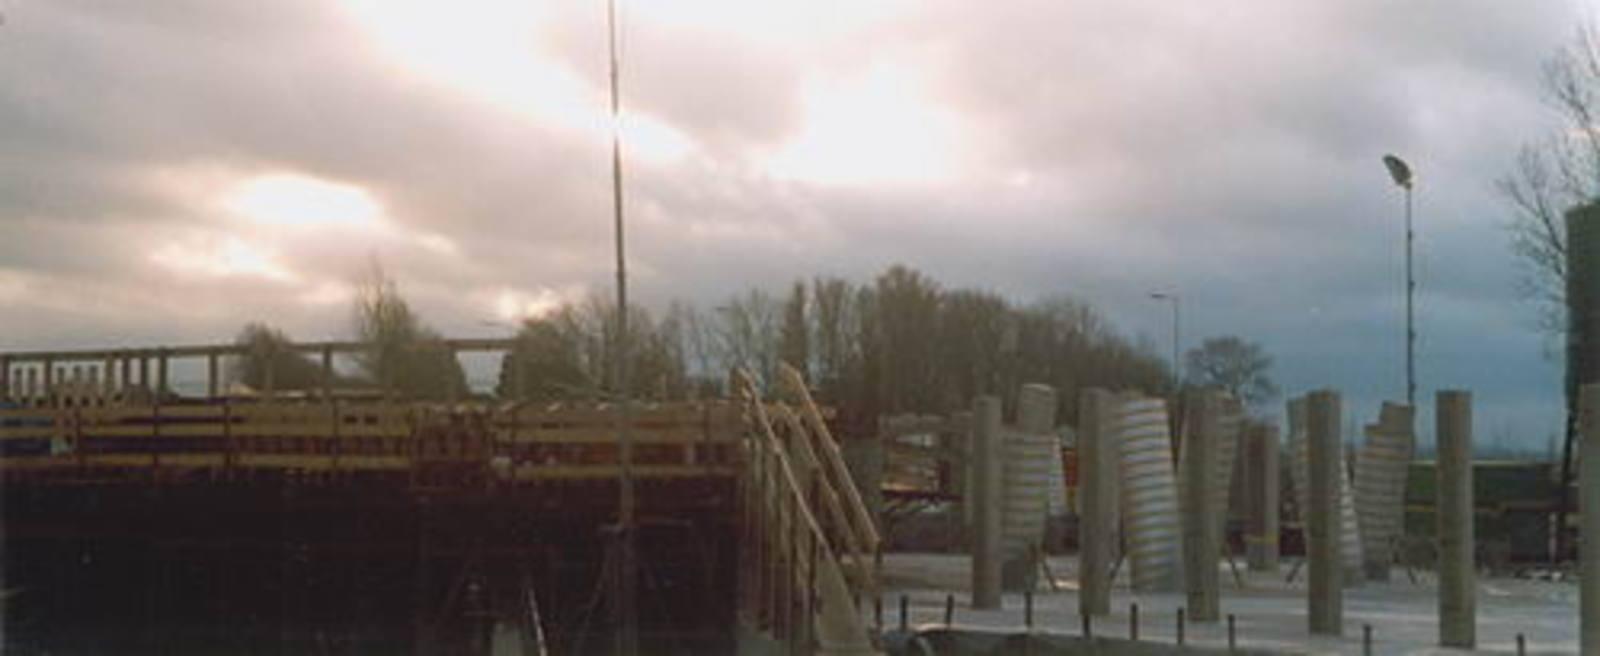 Hoofdweg W 0370± bouw Viaduct Taxibaan Schiphol 03